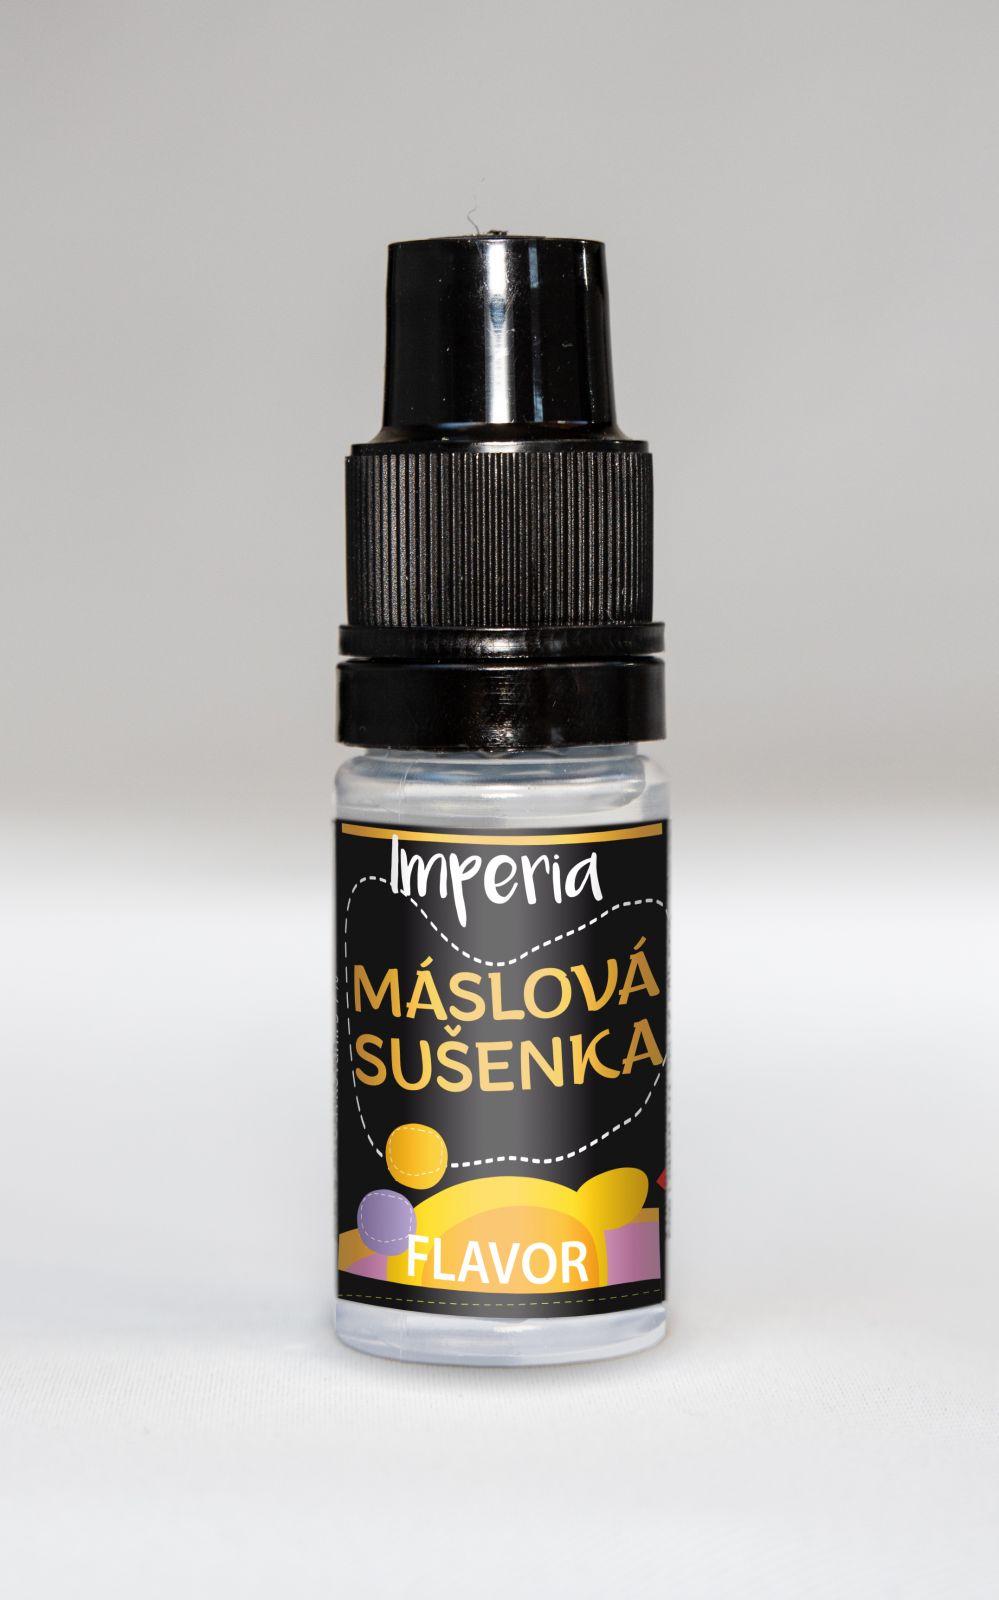 MÁSLOVÁ SUŠENKA - Aroma Imperia Black Label Boudoir Samadhi s.r.o.